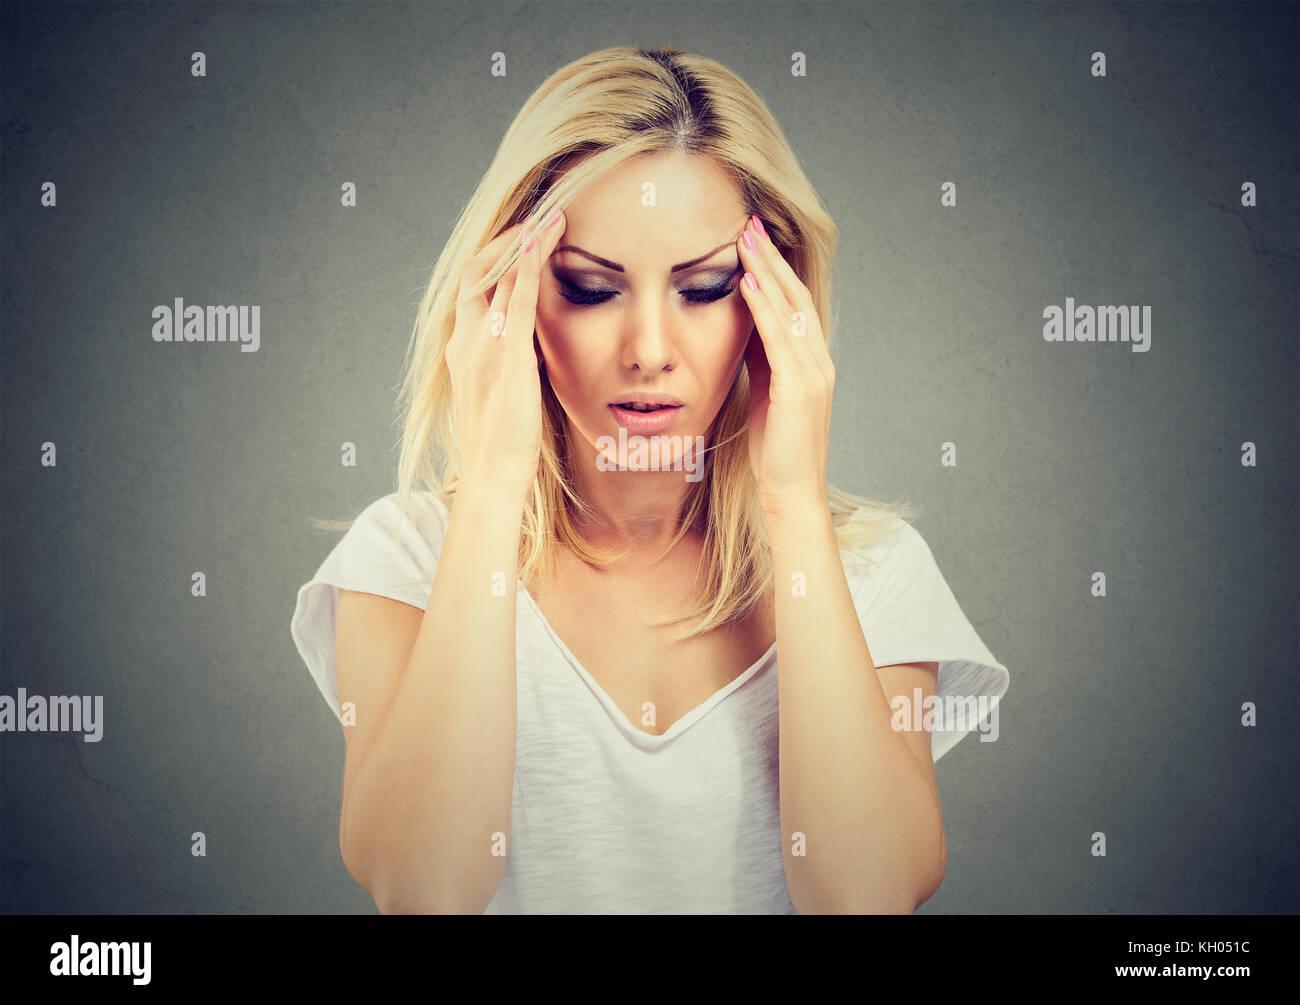 Closeup retrato triste joven mujer hermosa con destacó expresión de cara mirando hacia abajo Imagen De Stock